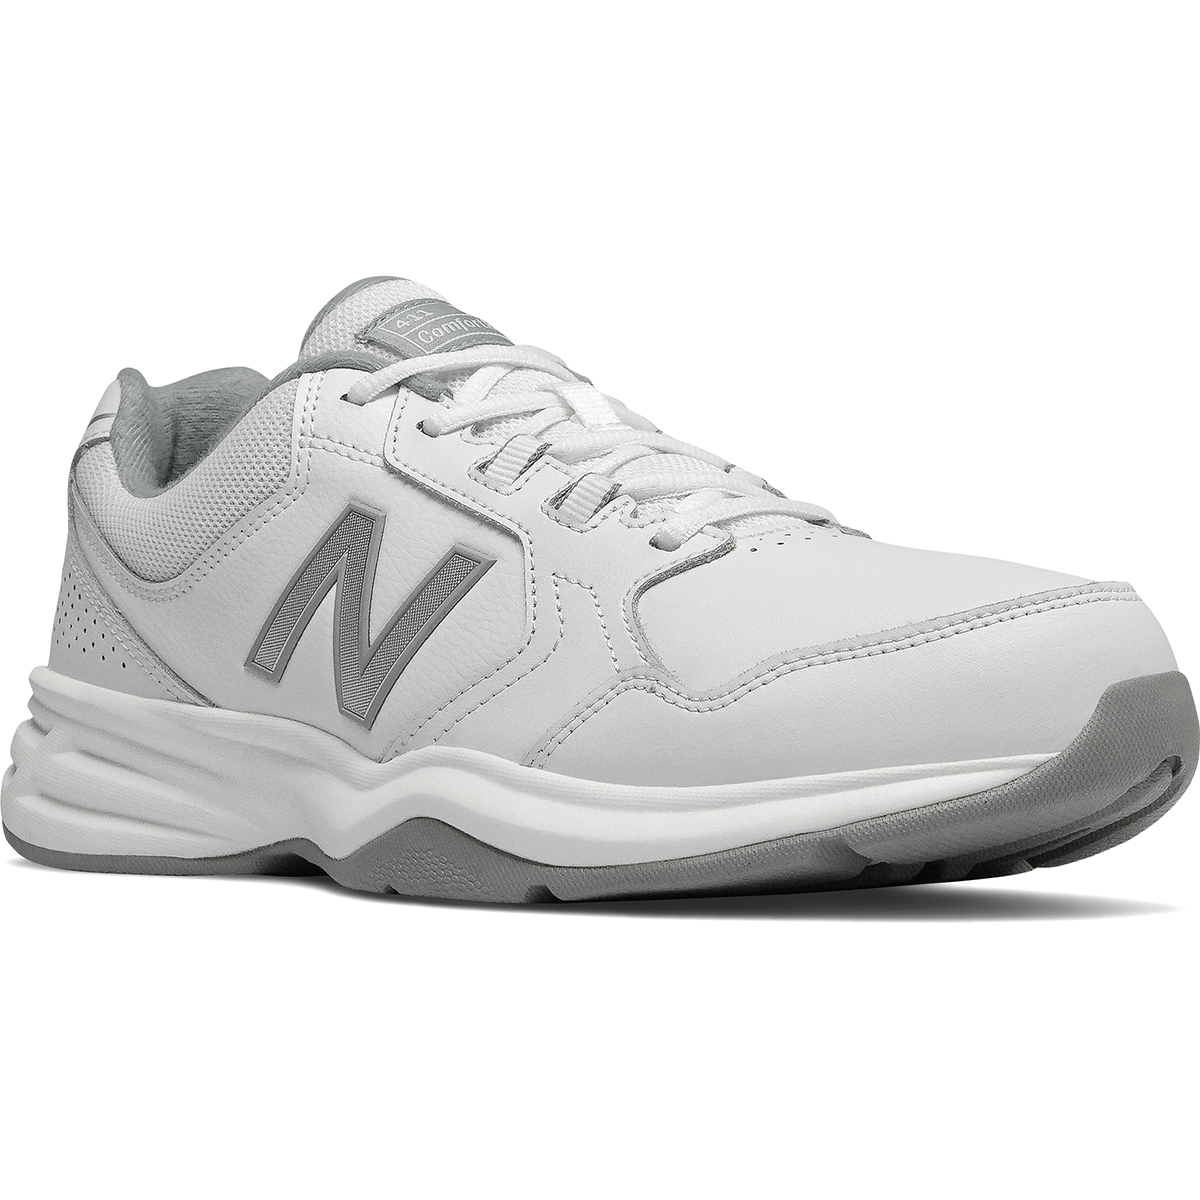 New Balance Men's 411 Walking Shoes, Wide - White, 11.5